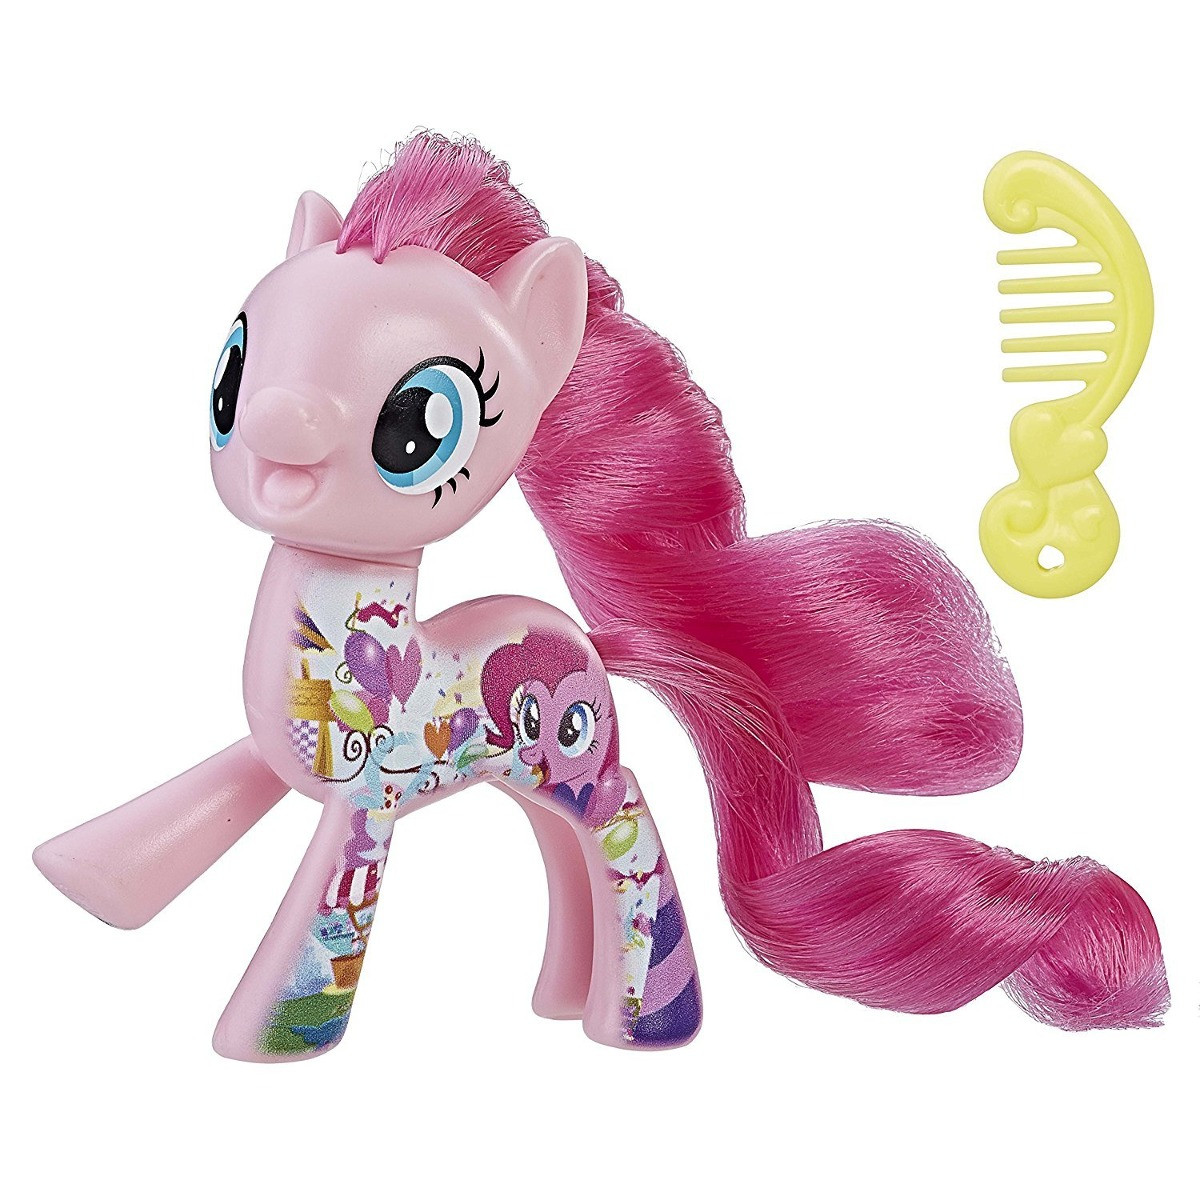 My Little Pony - фігурка Пінкі Пай  ( Pinkie Pie Movie, Май Литл Пони Пинки Пай )